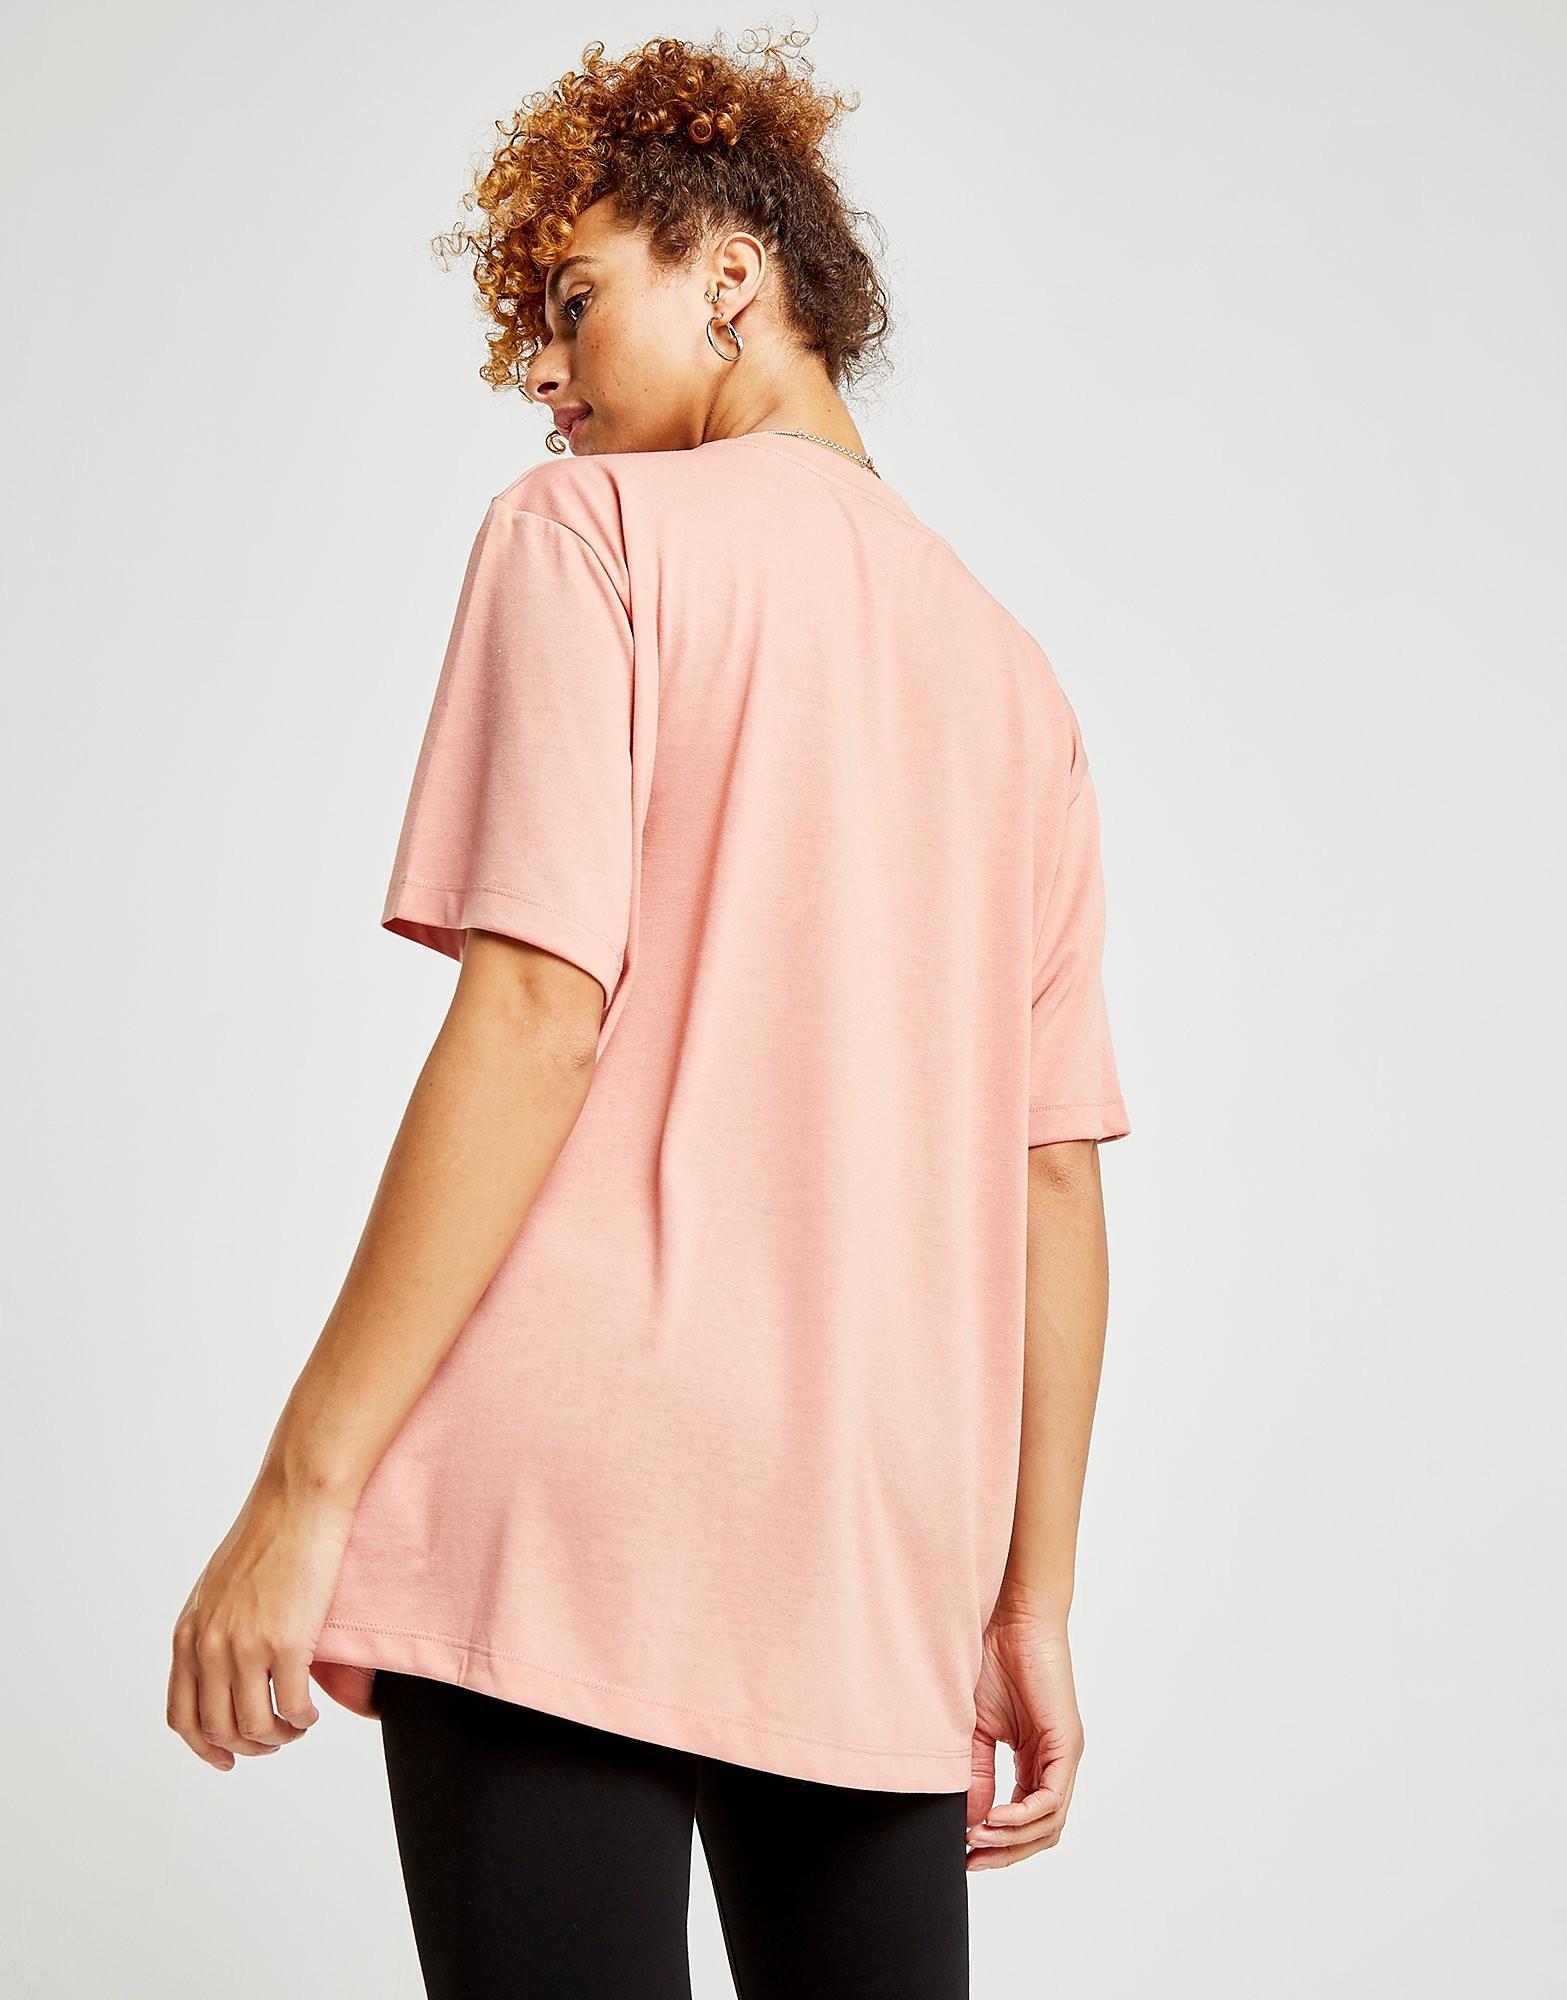 IVY PARK Boyfriend T-Shirt